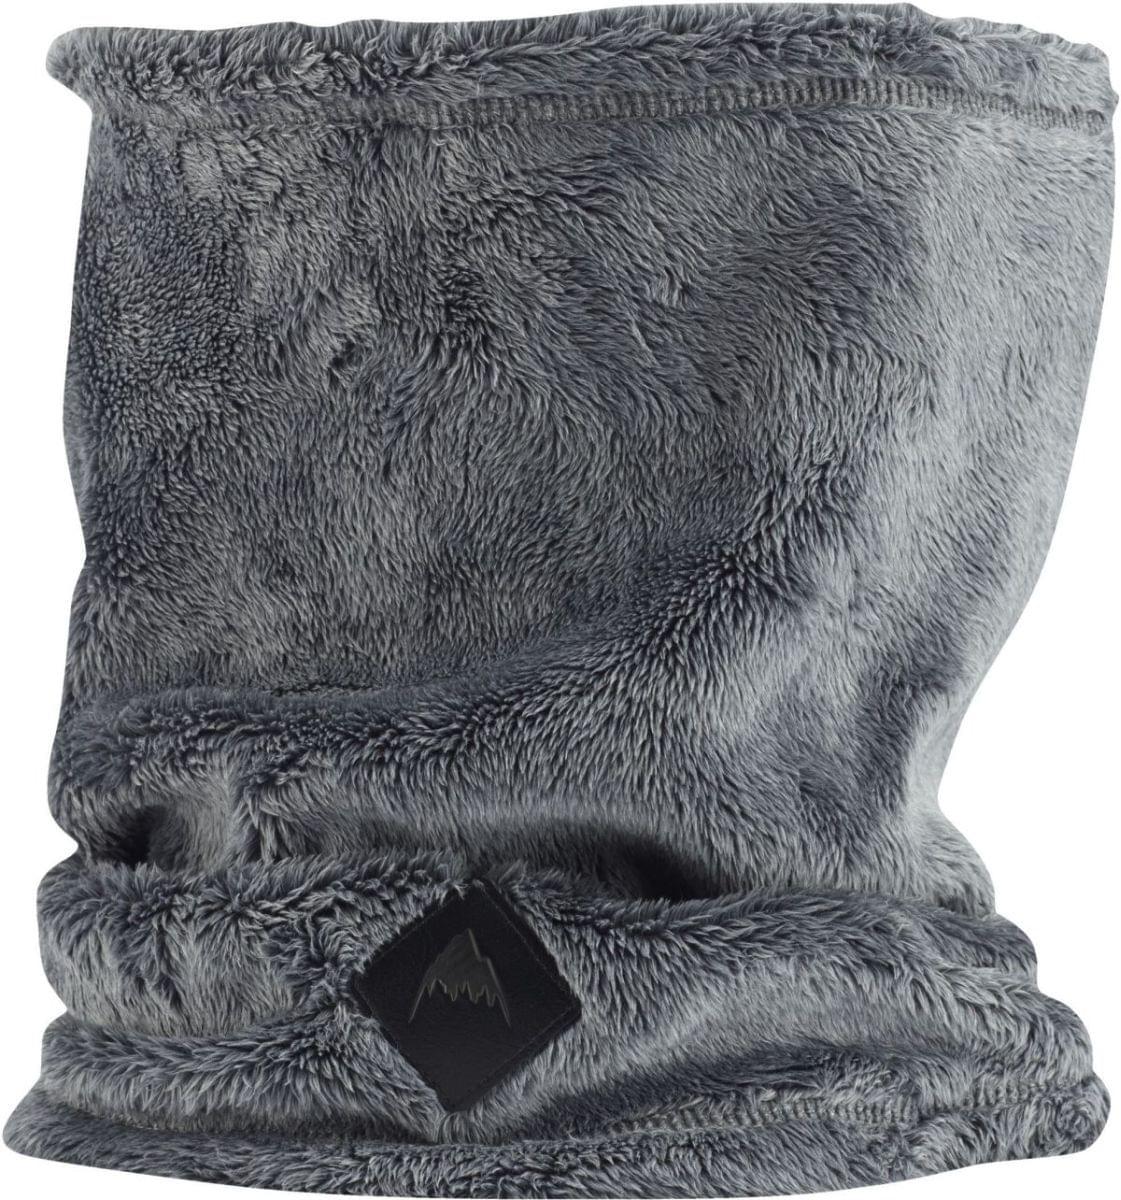 c8b61d76598 Dámský fleecový nákrčník Burton Cora Neck Warmer - true black grey ...